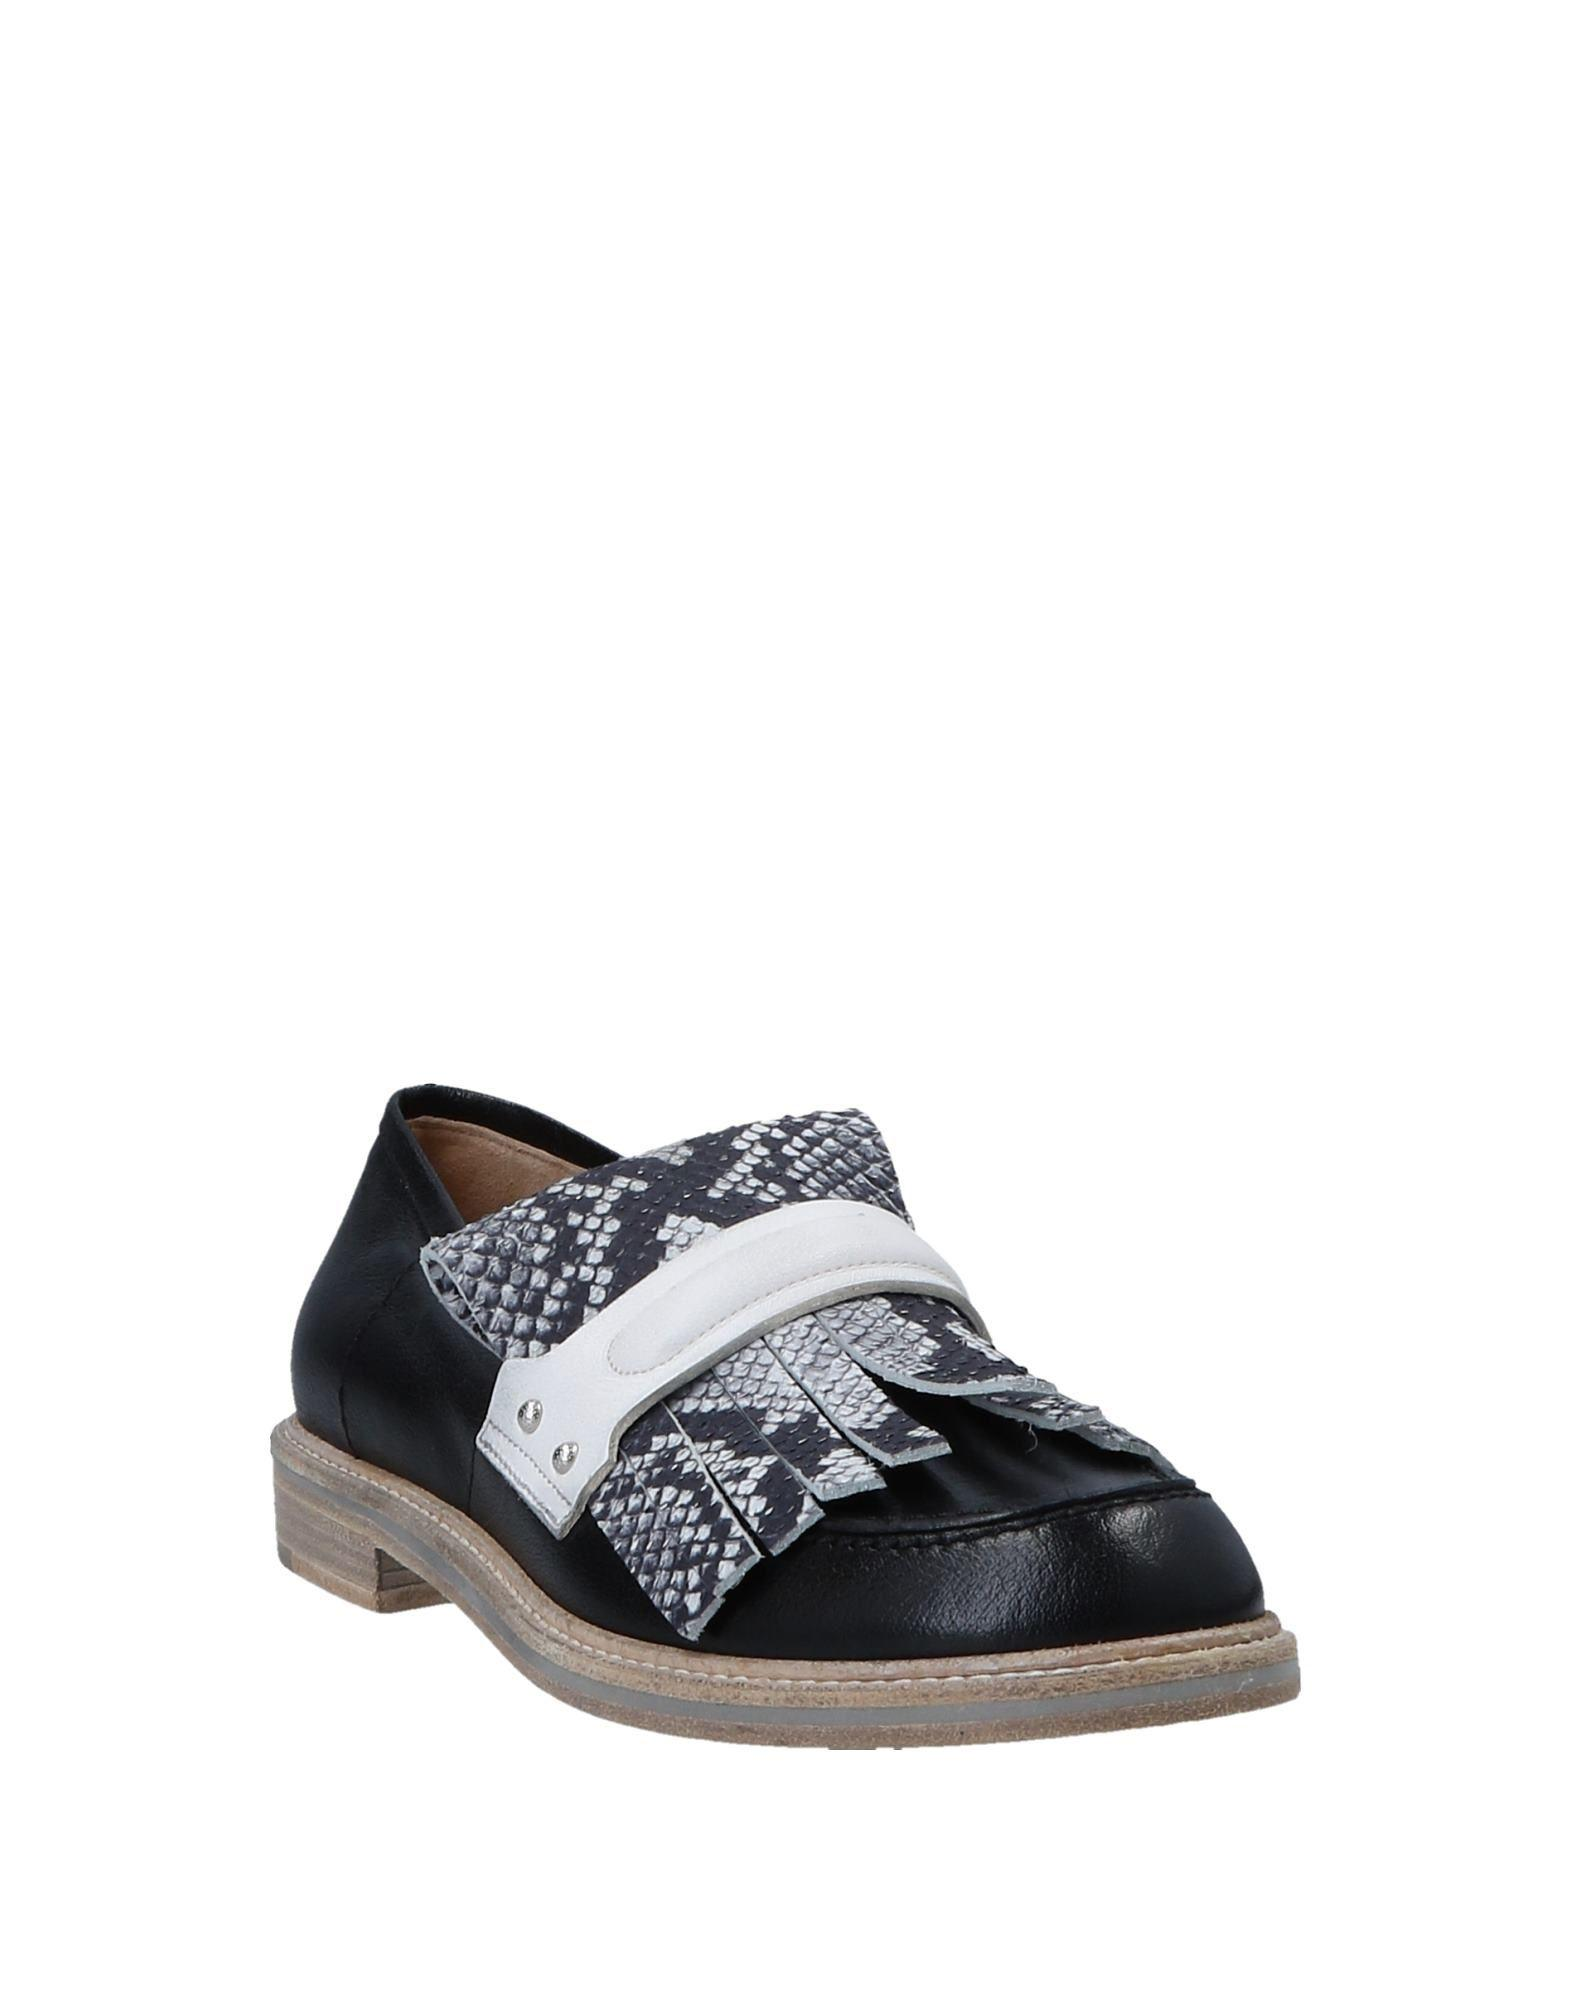 a15fd5edd11 Laura Bellariva - Black Loafer - Lyst. View fullscreen